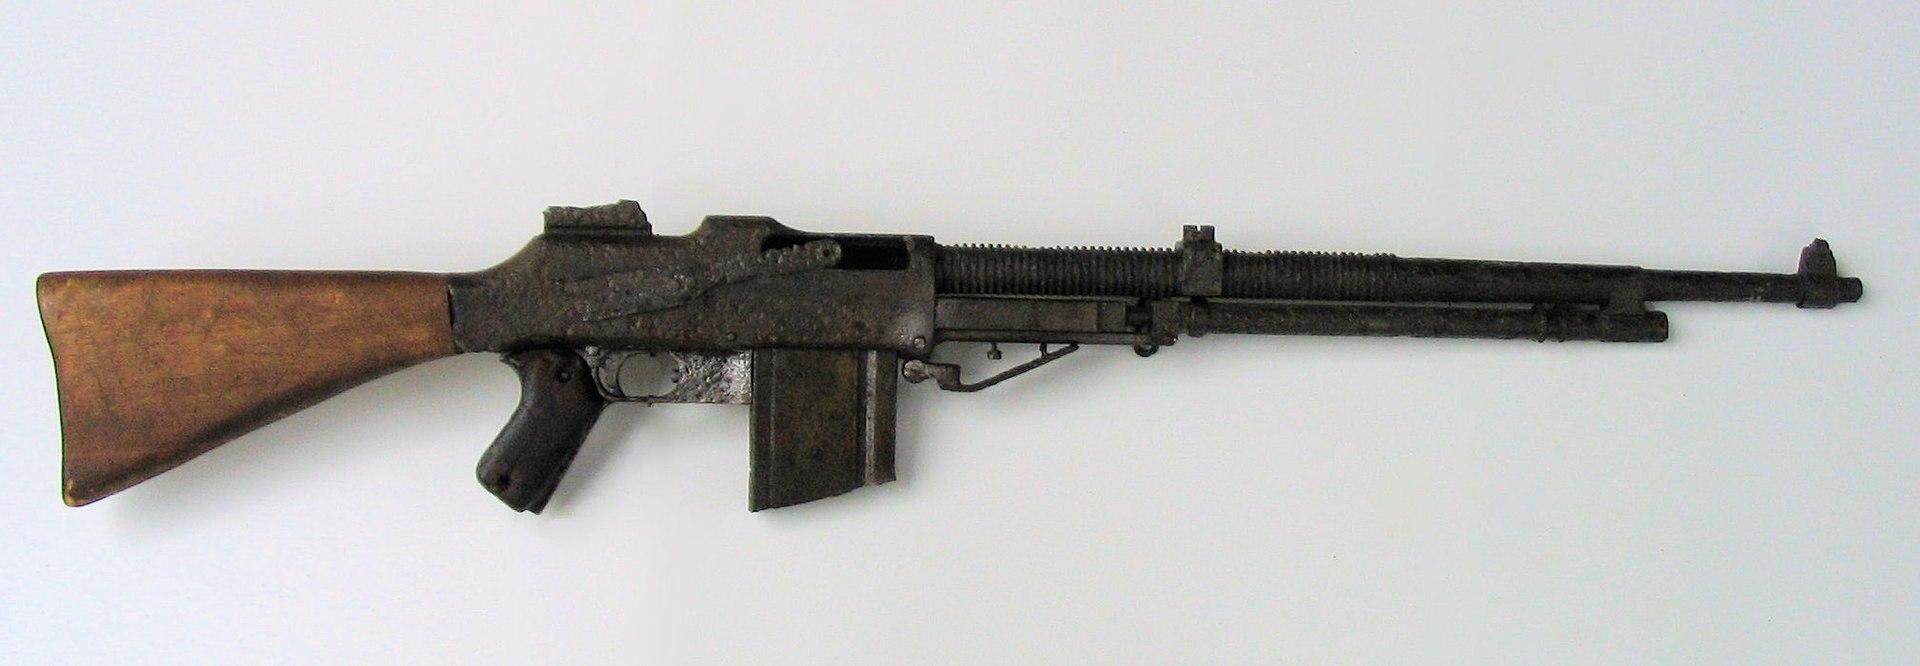 1920px-RKM_Browning_wz._1928%2C_Muzeum_Or%C5%82a_Bia%C5%82ego.jpg